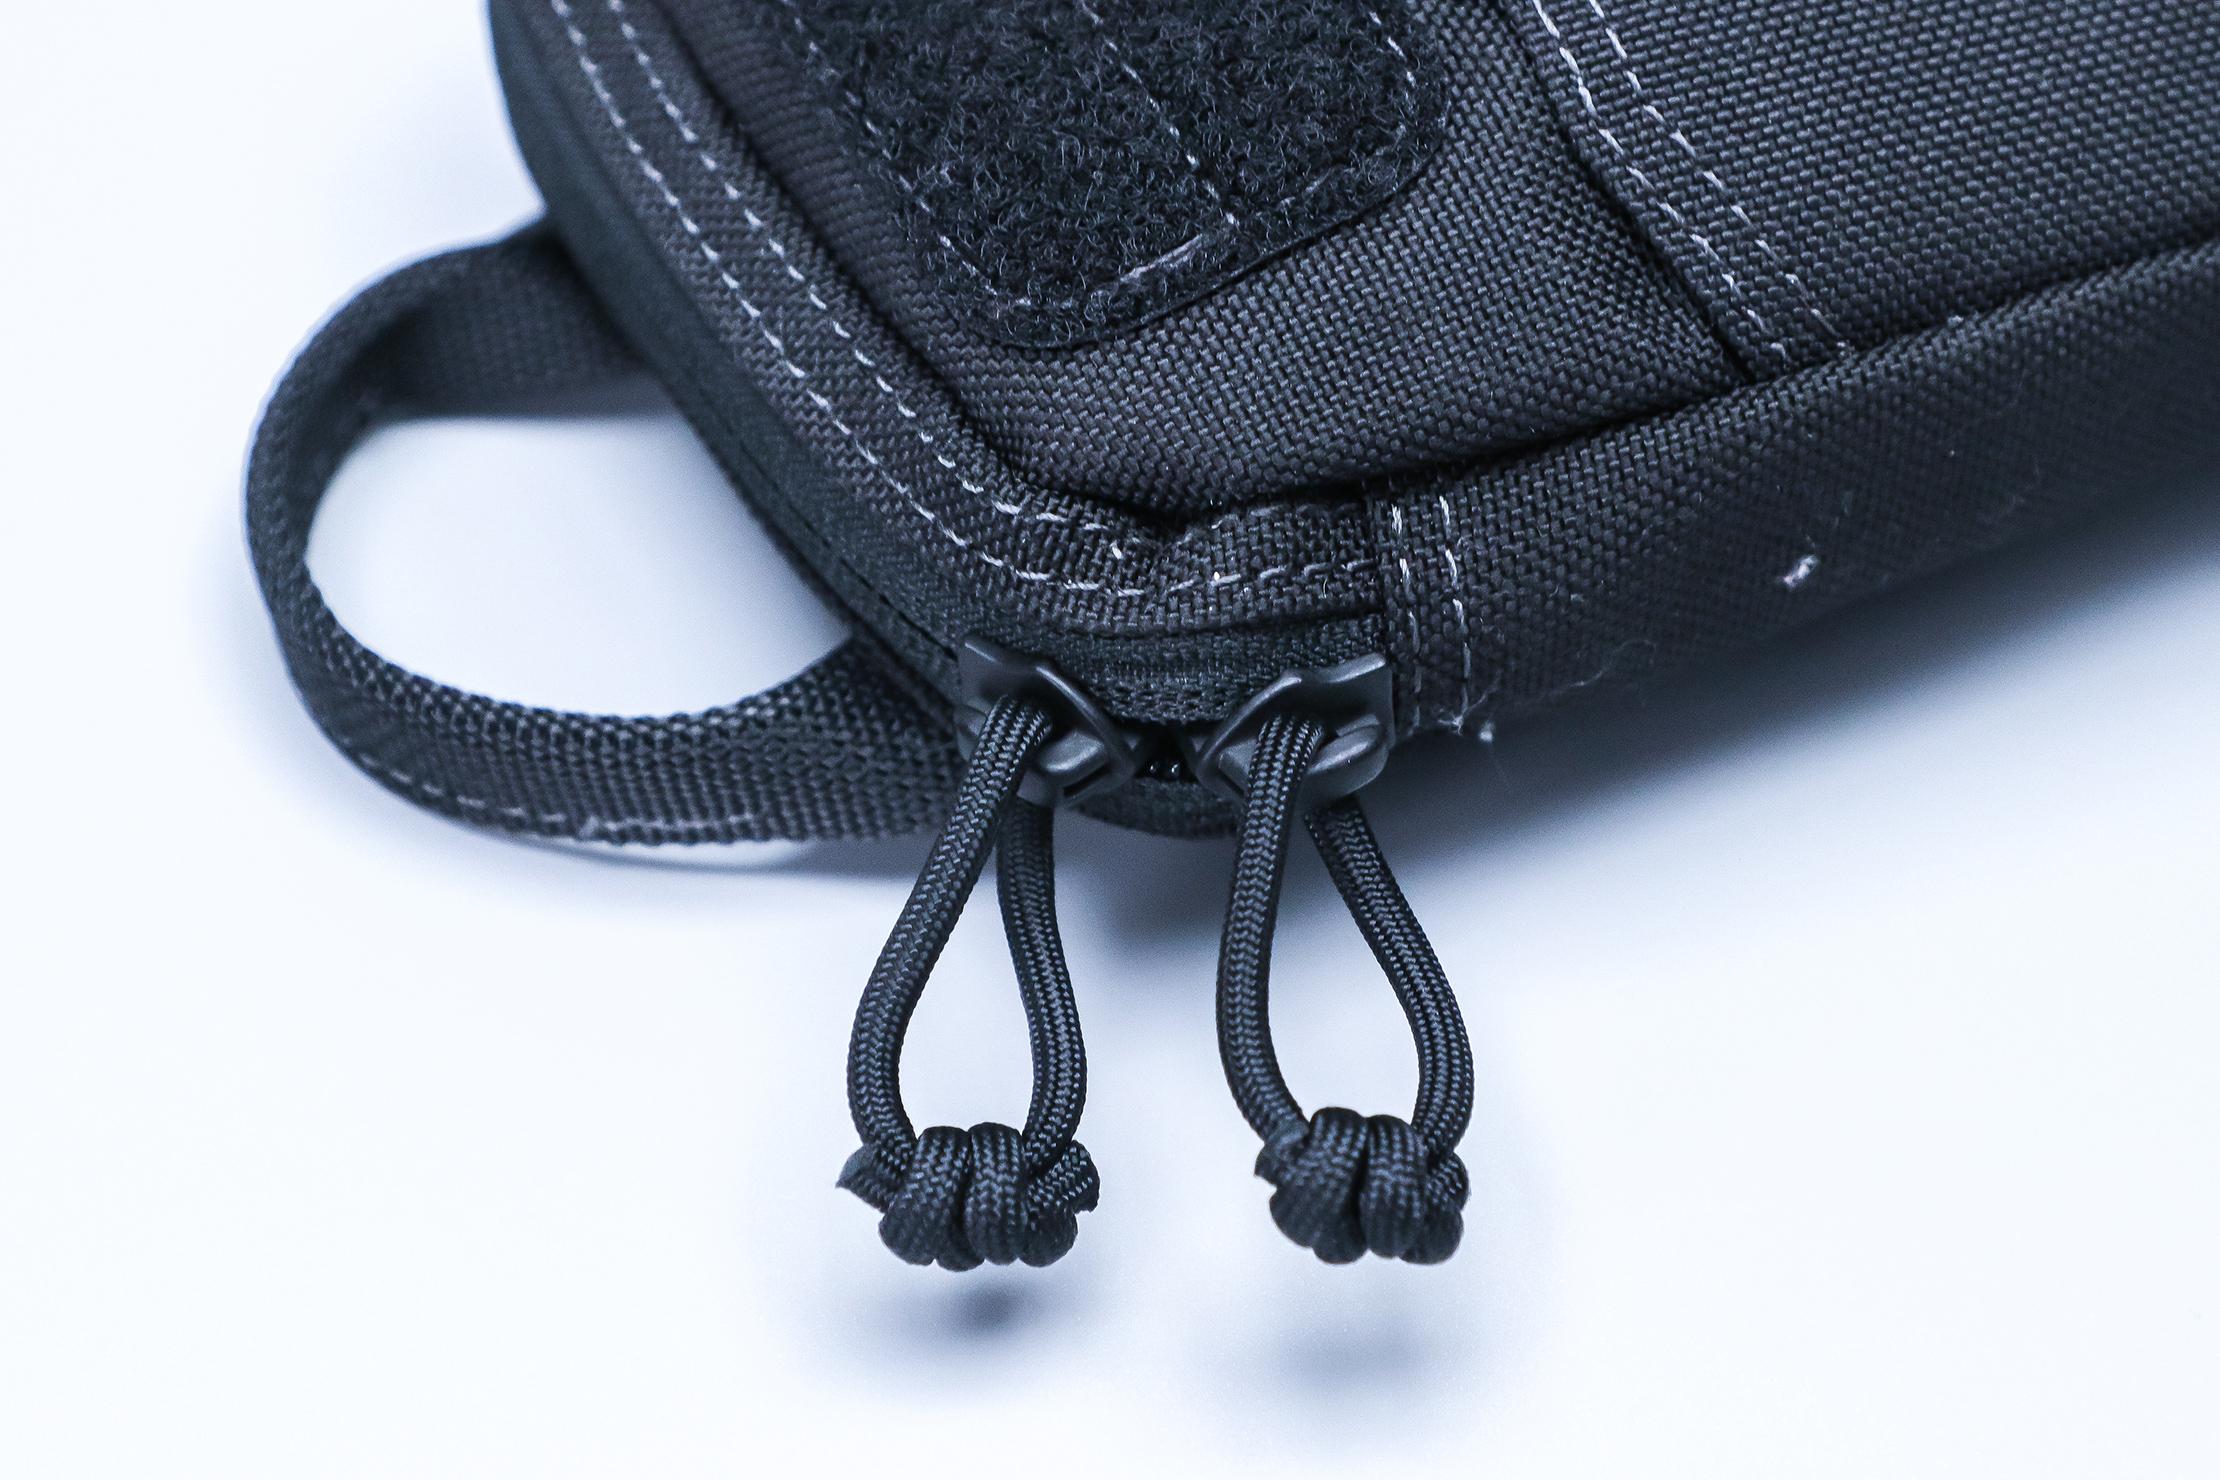 Vanquest PPM-HUSKY 2.0 Zippers